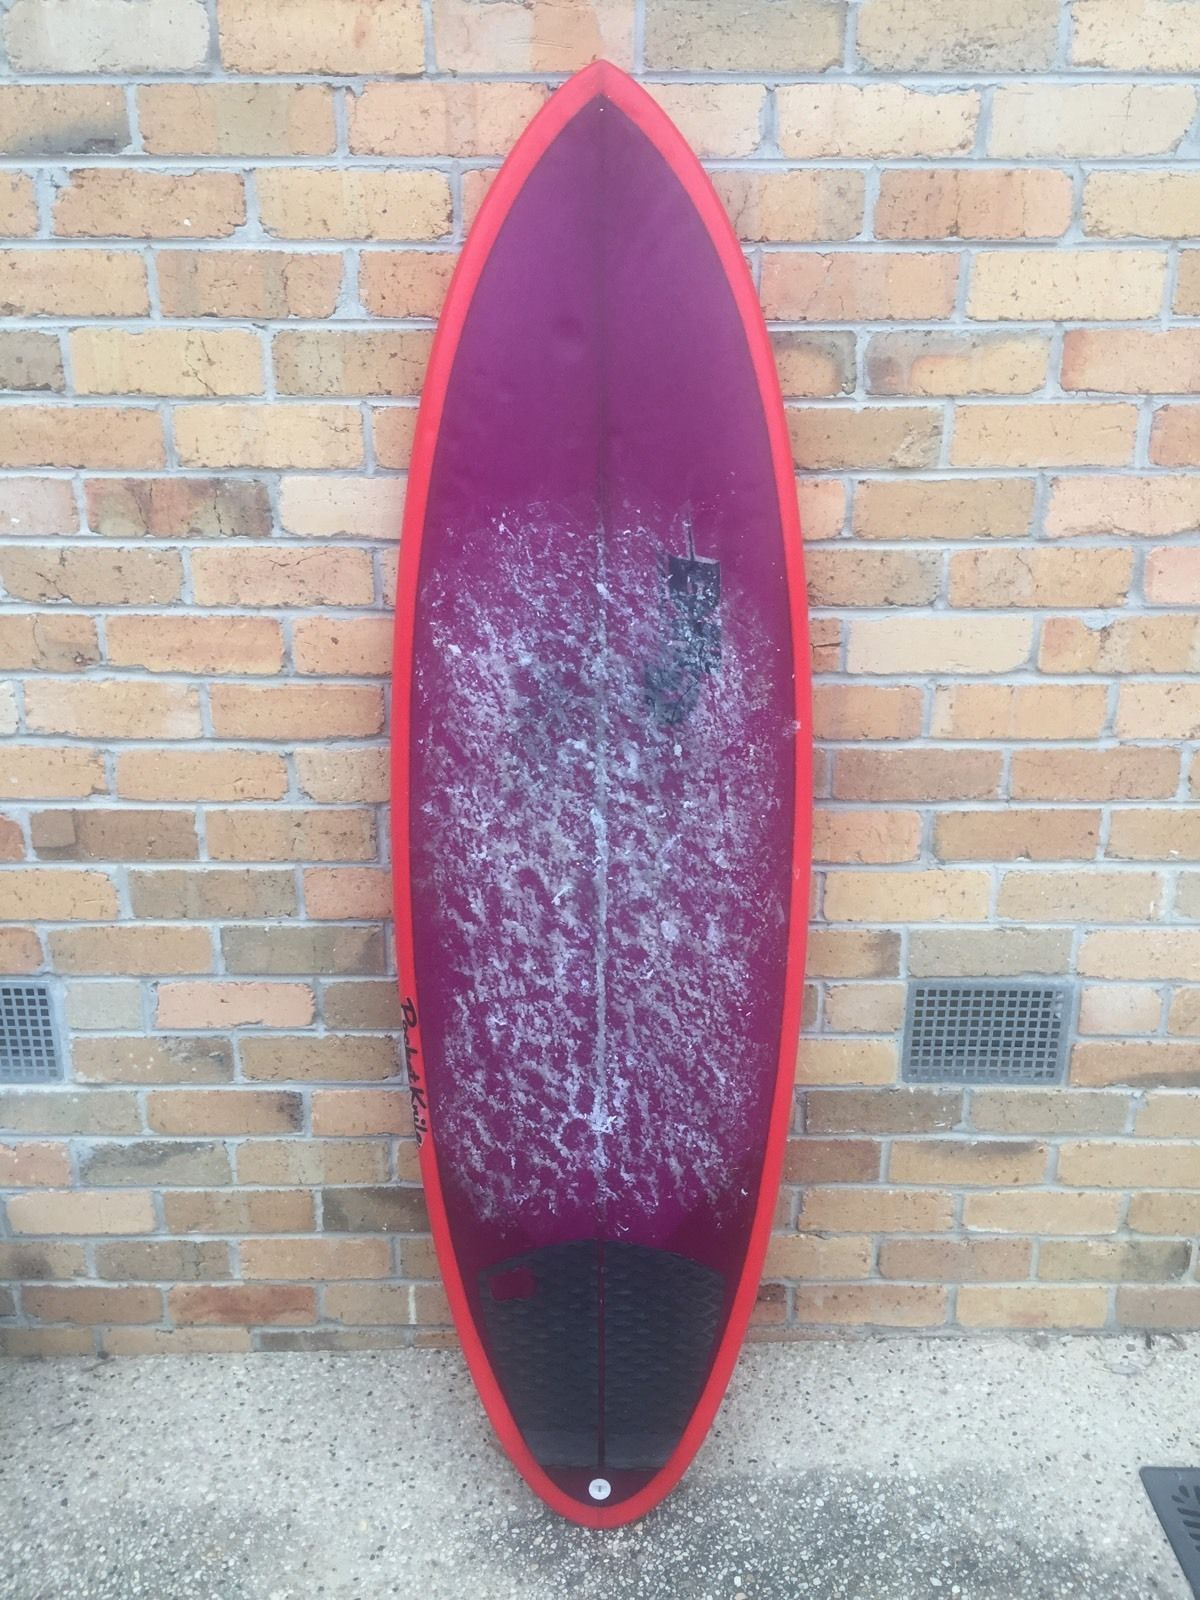 Dhd Pocketknife 5 10 Ebay Surfboard Design Surfboard Ebay